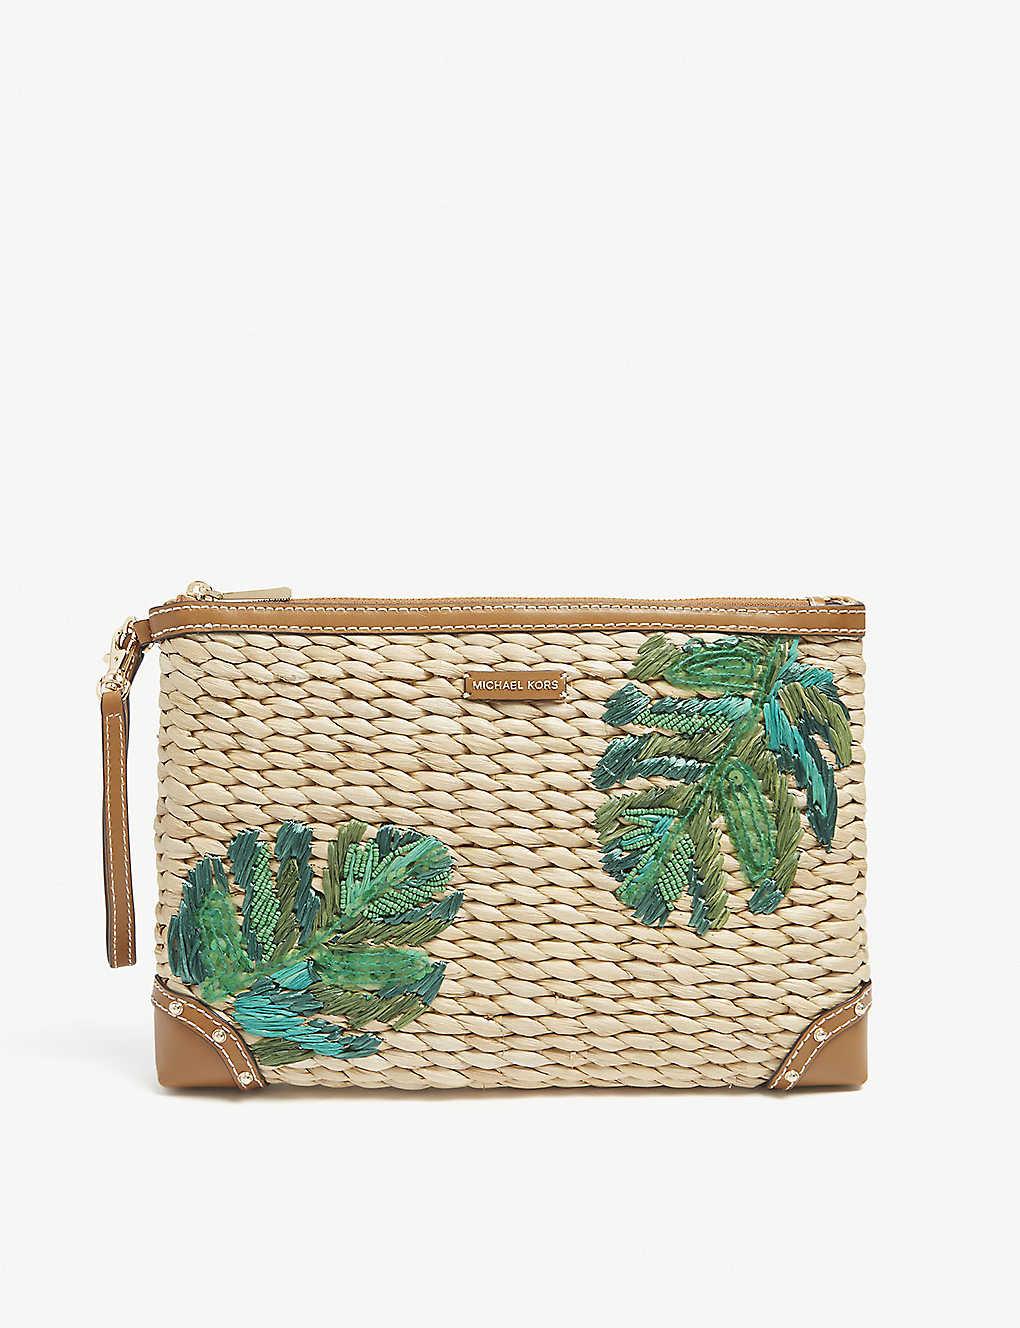 ac12e551d848 MICHAEL MICHAEL KORS - Leaf embroidered straw clutch bag ...